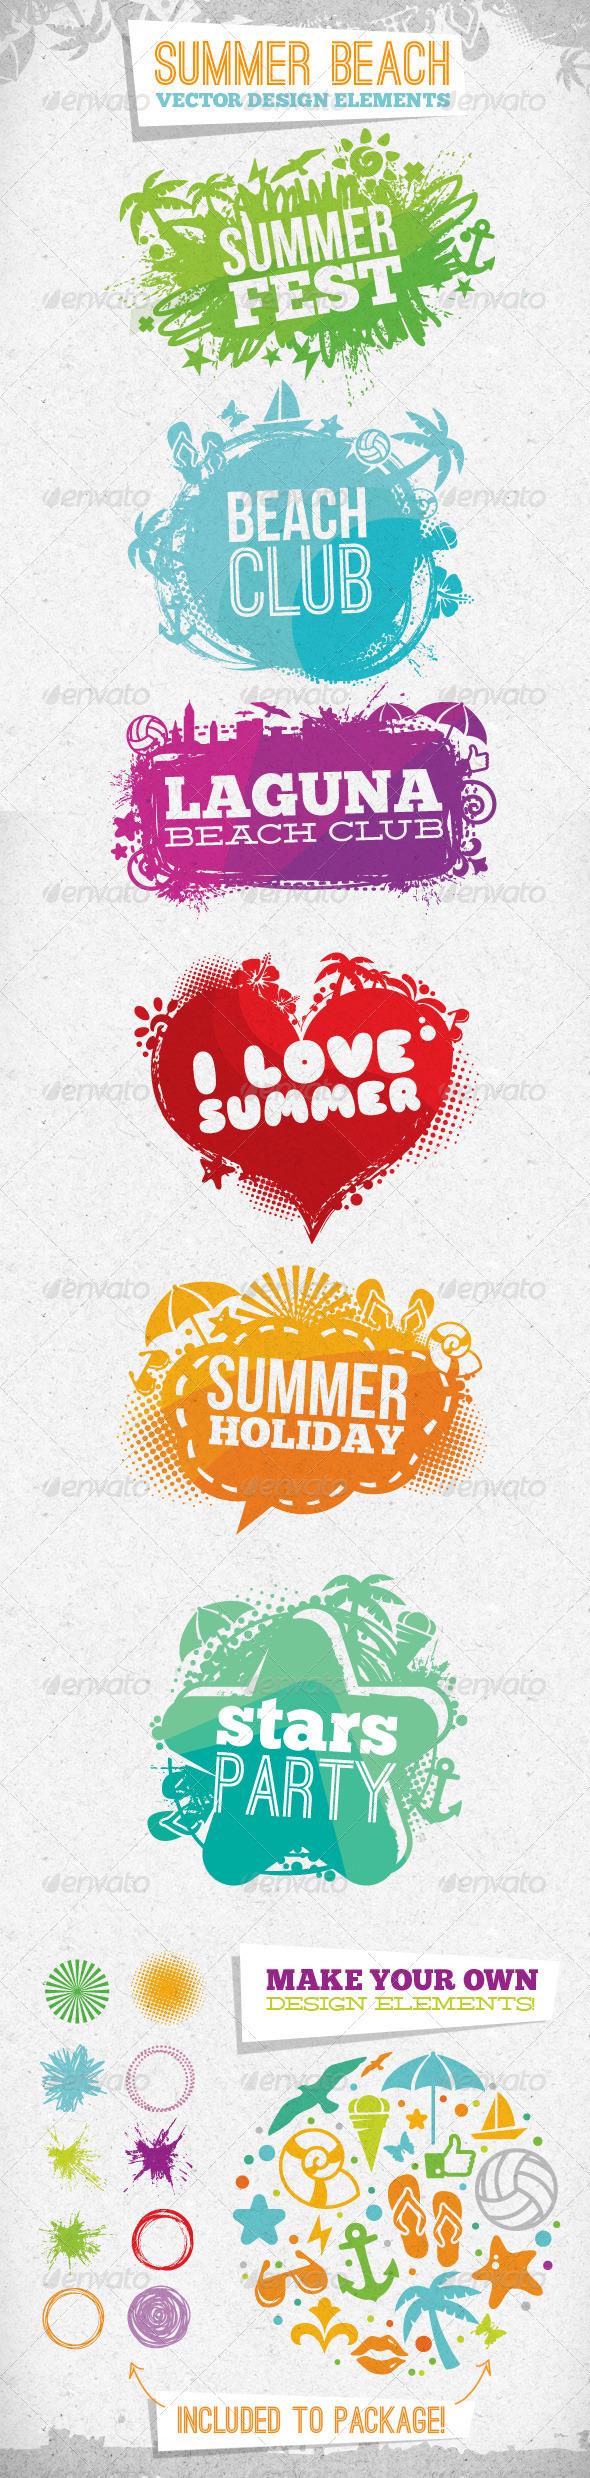 GraphicRiver Summer Beach Creative Vector Design Elements 2622171